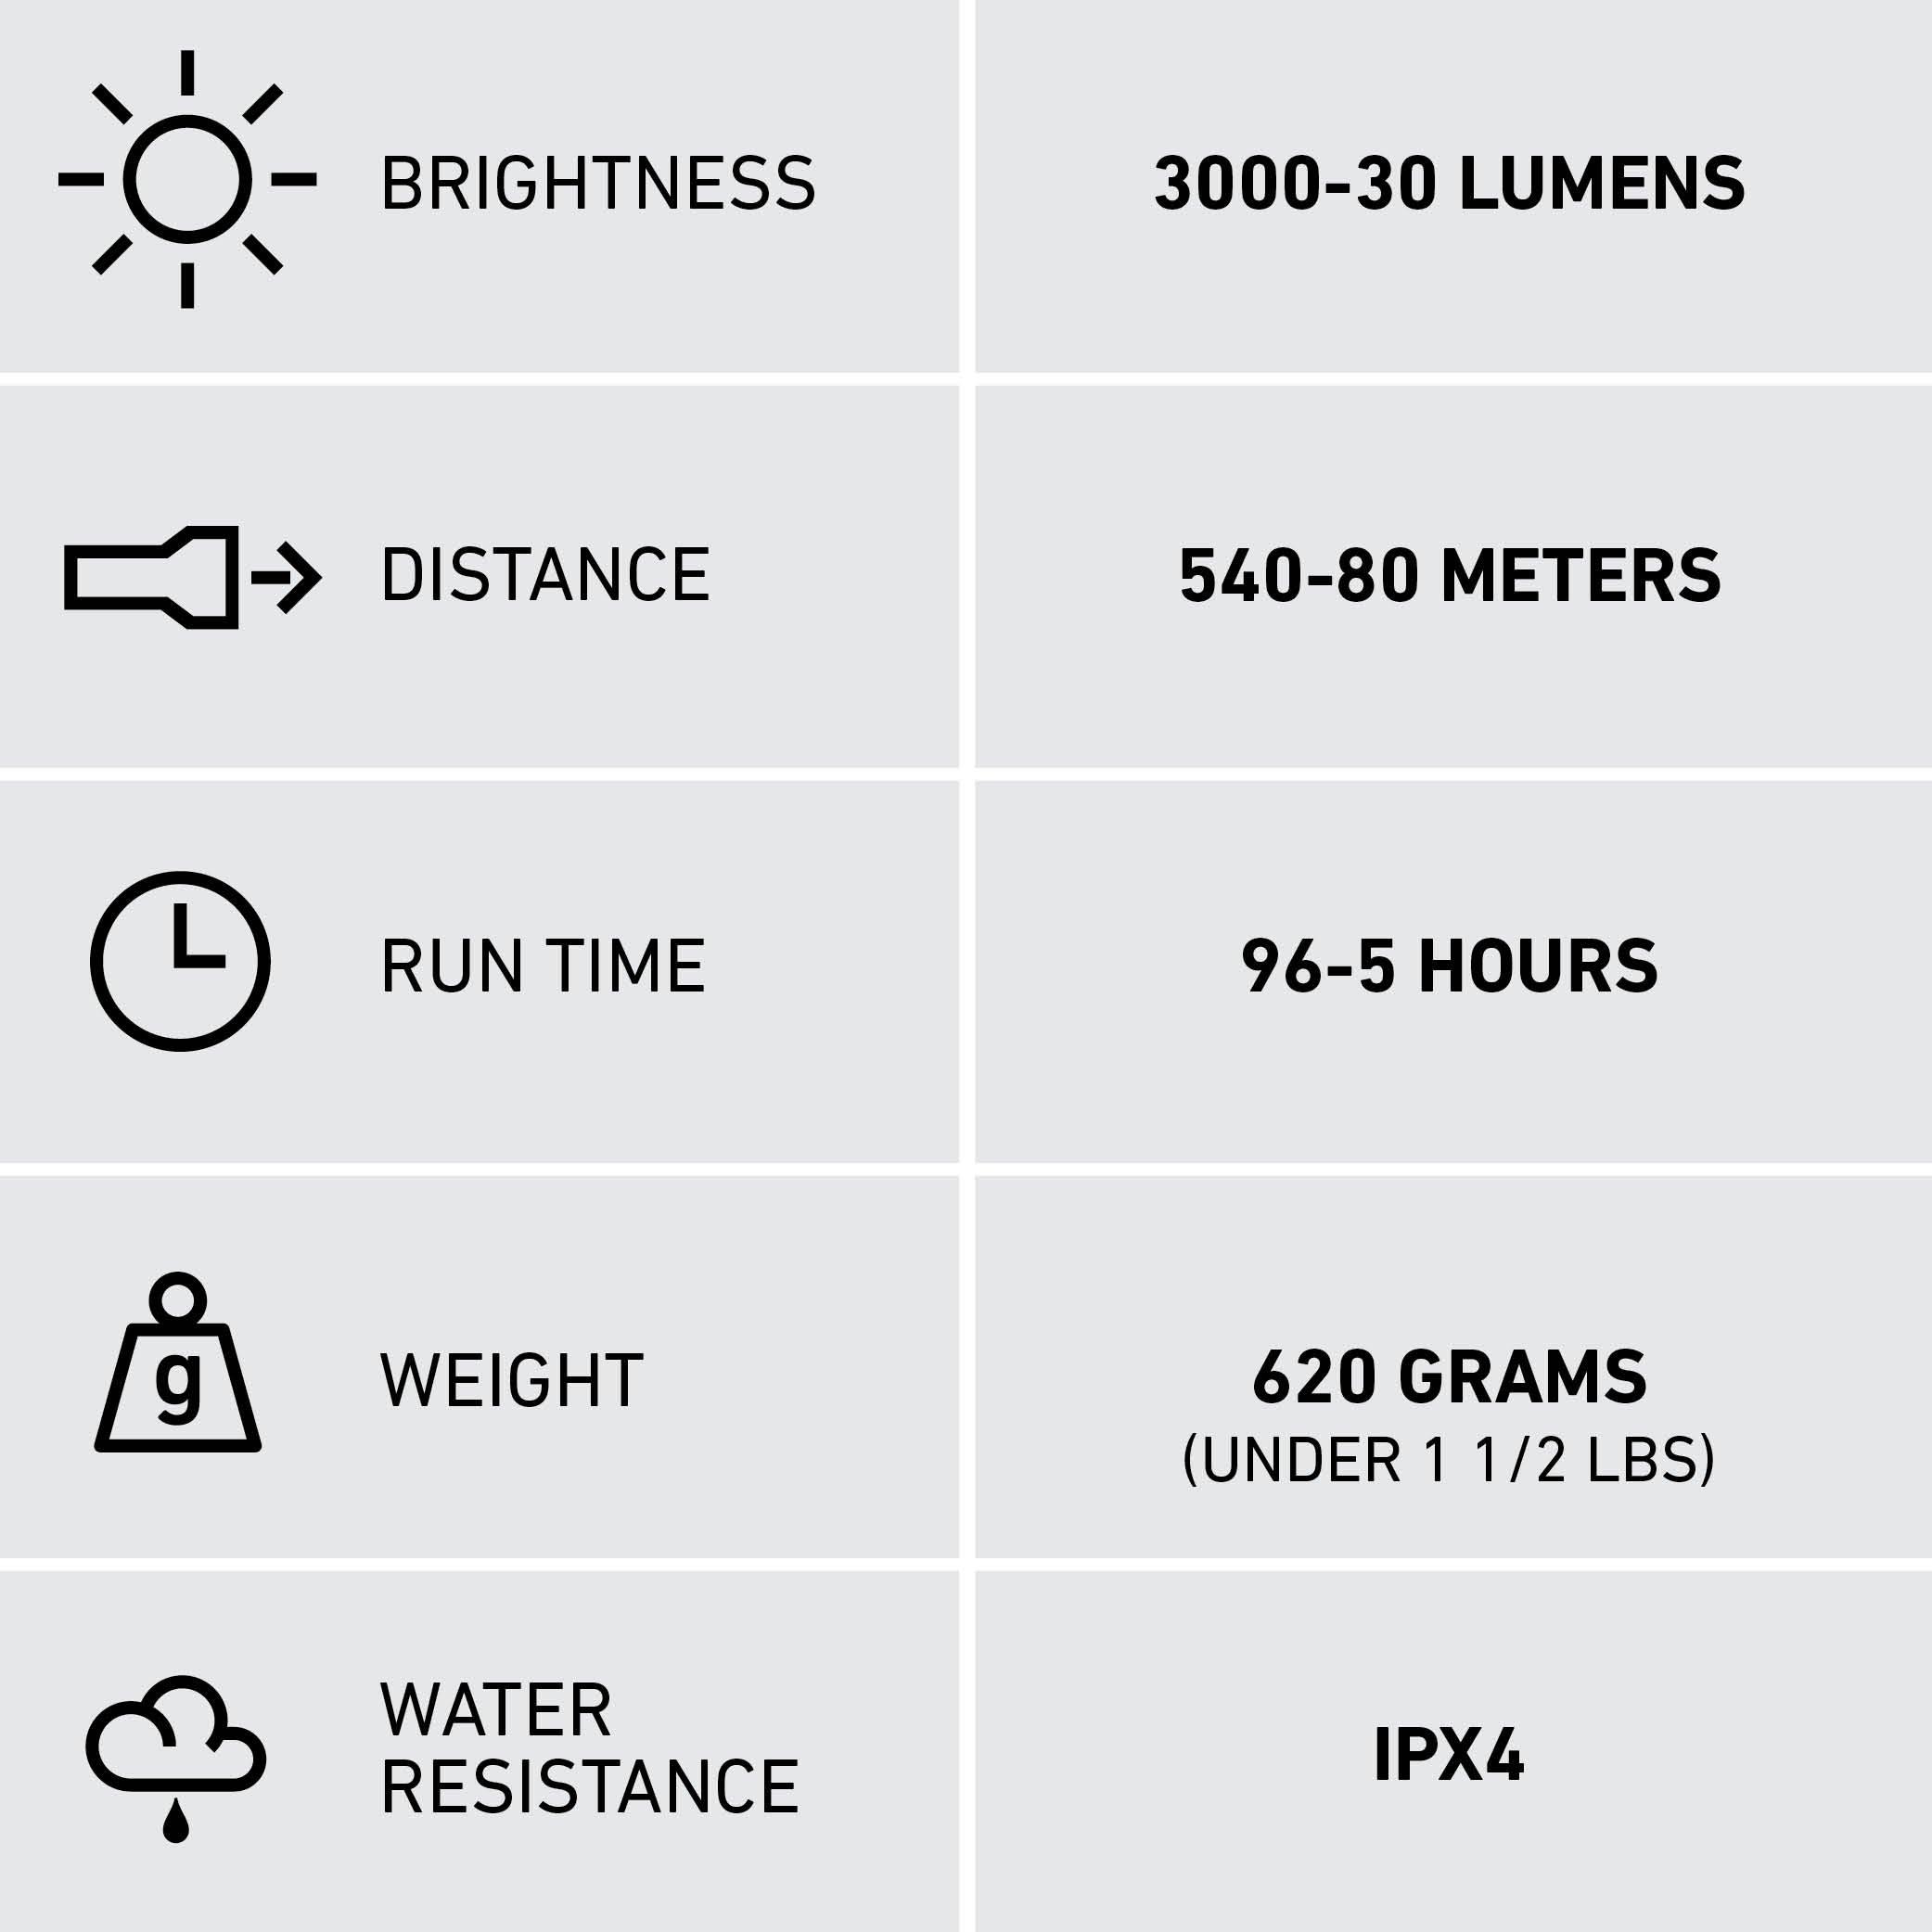 Led Lenser - 3000 Lumens, MT18 Flashlight with Rapid Focus System by LED Lenser (Image #3)